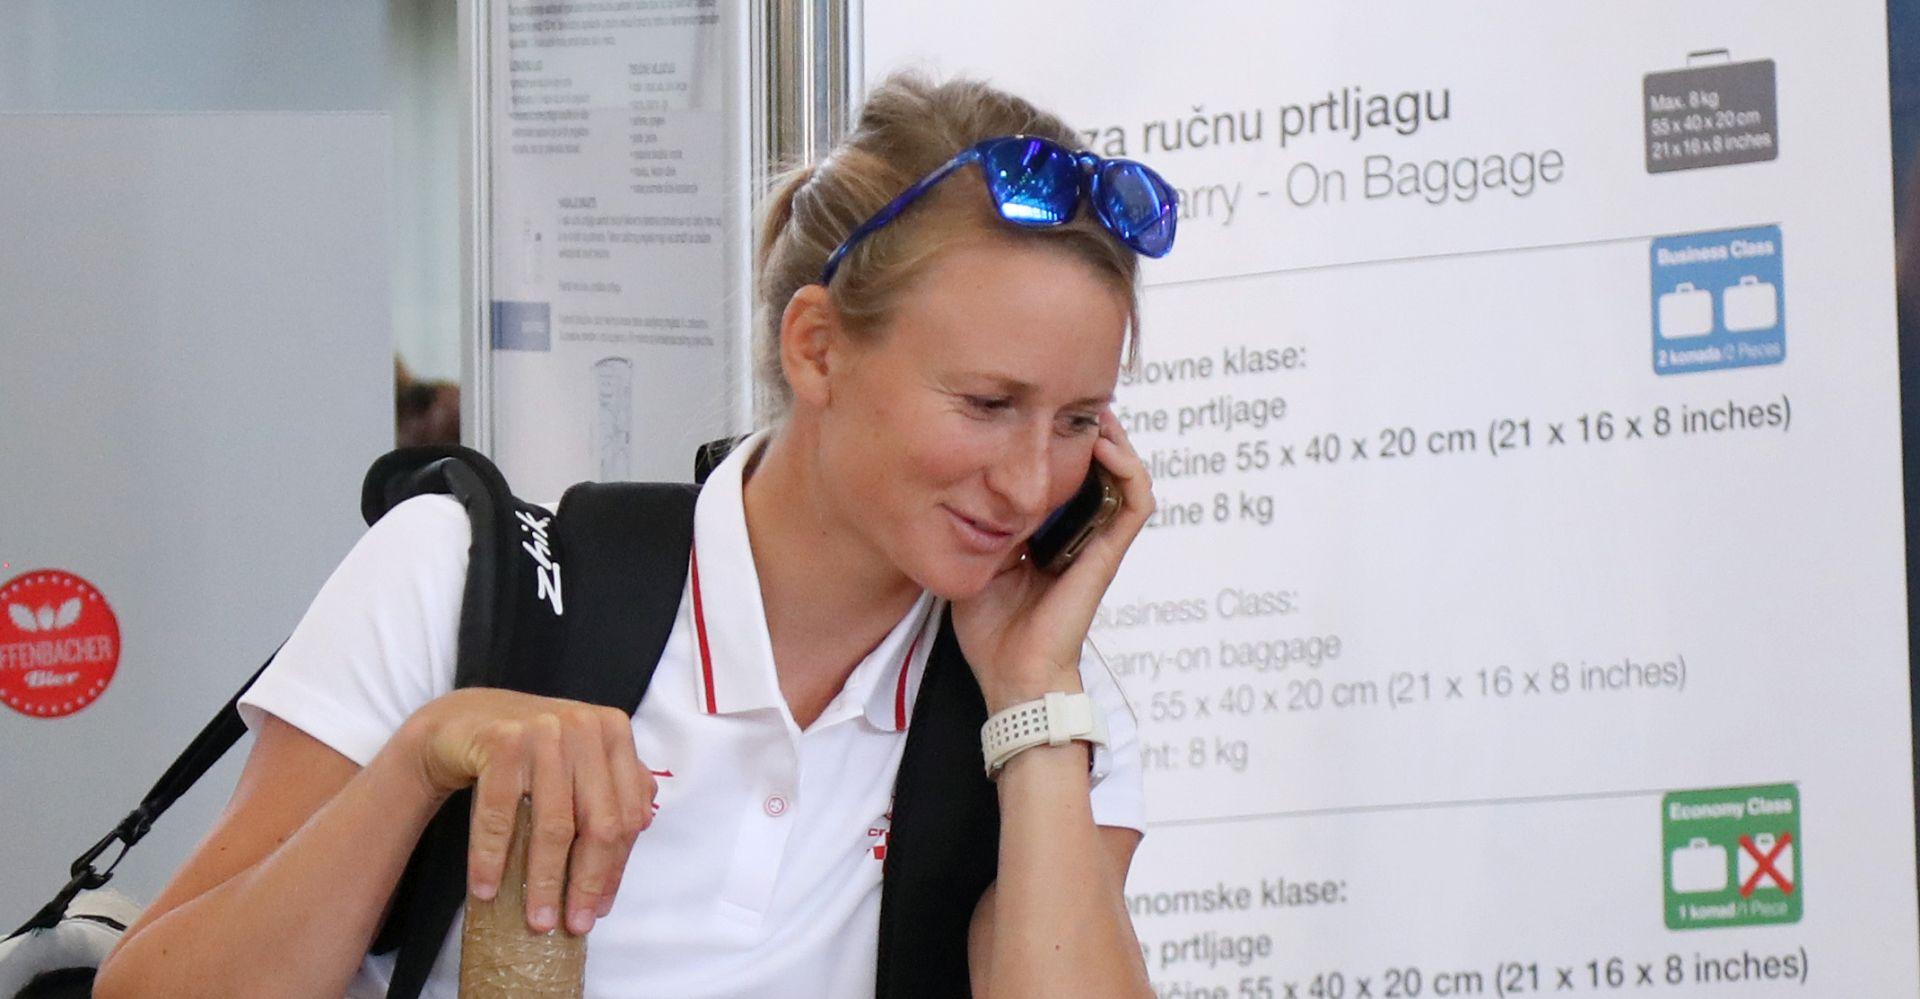 Prva hrvatska olimpijka otputovala u Rio de Janeiro